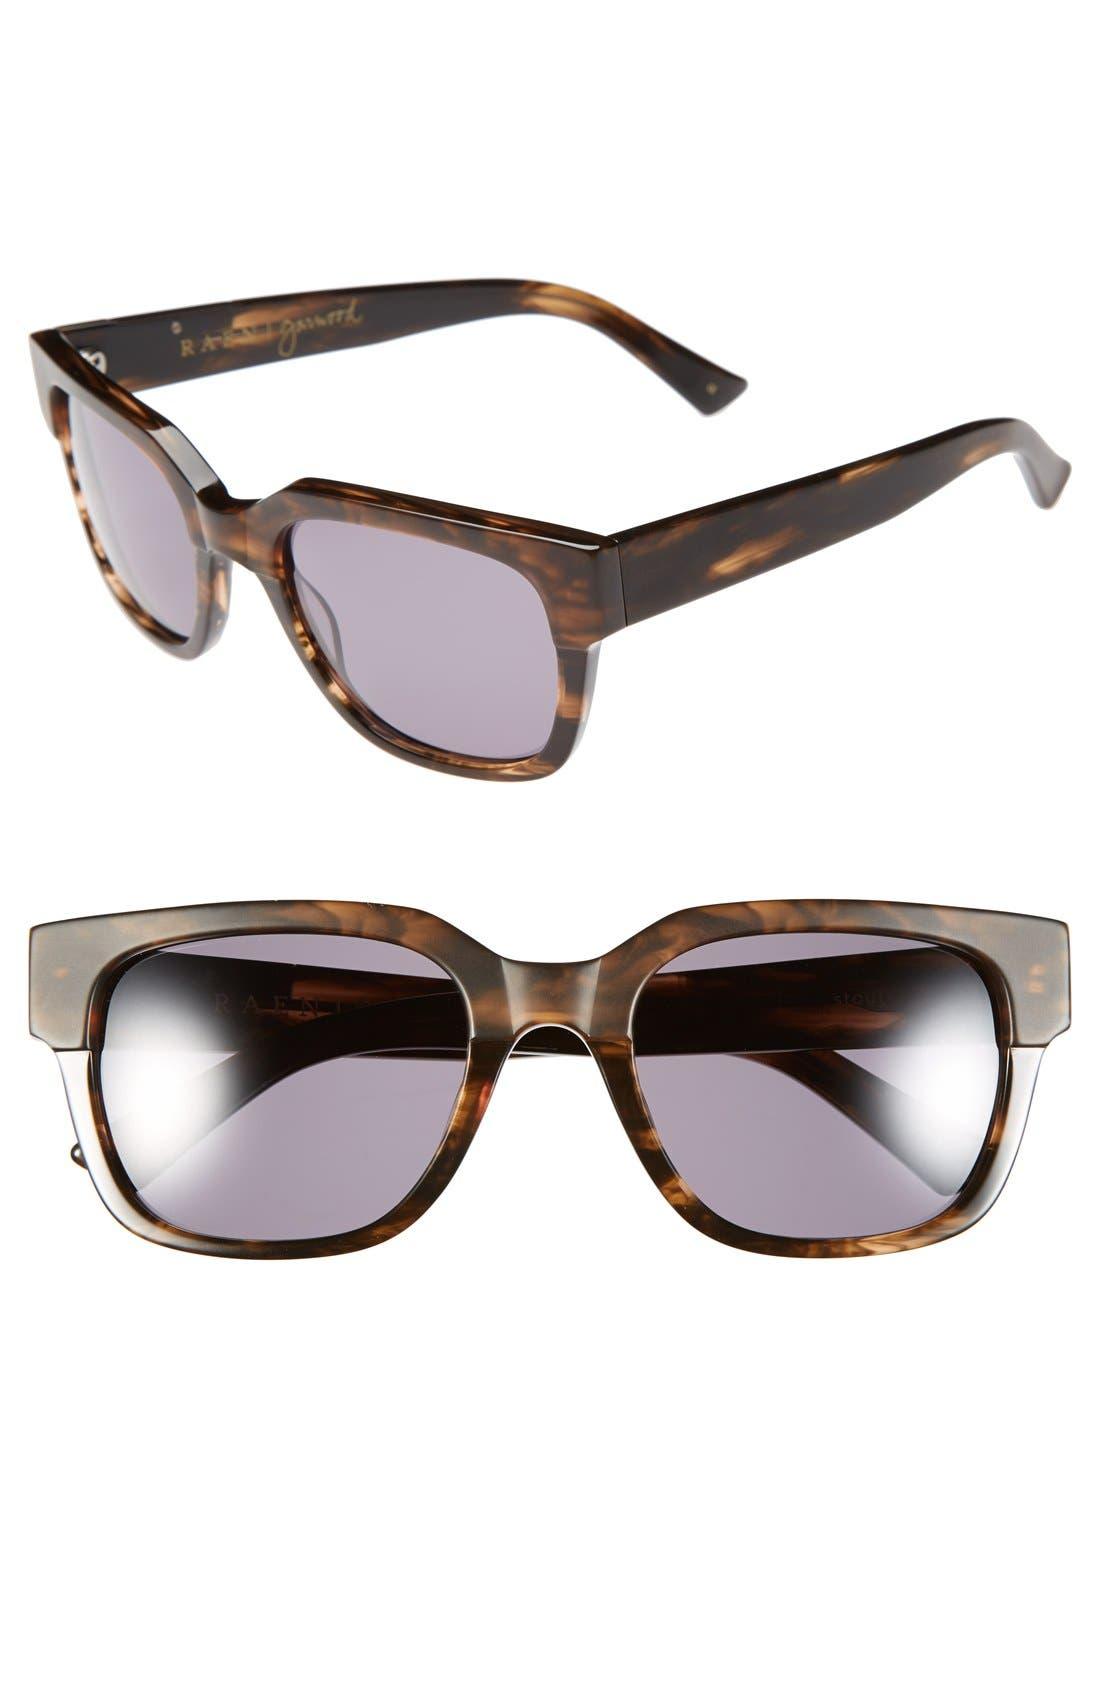 Main Image - RAEN 'Garwood' 55mm Sunglasses